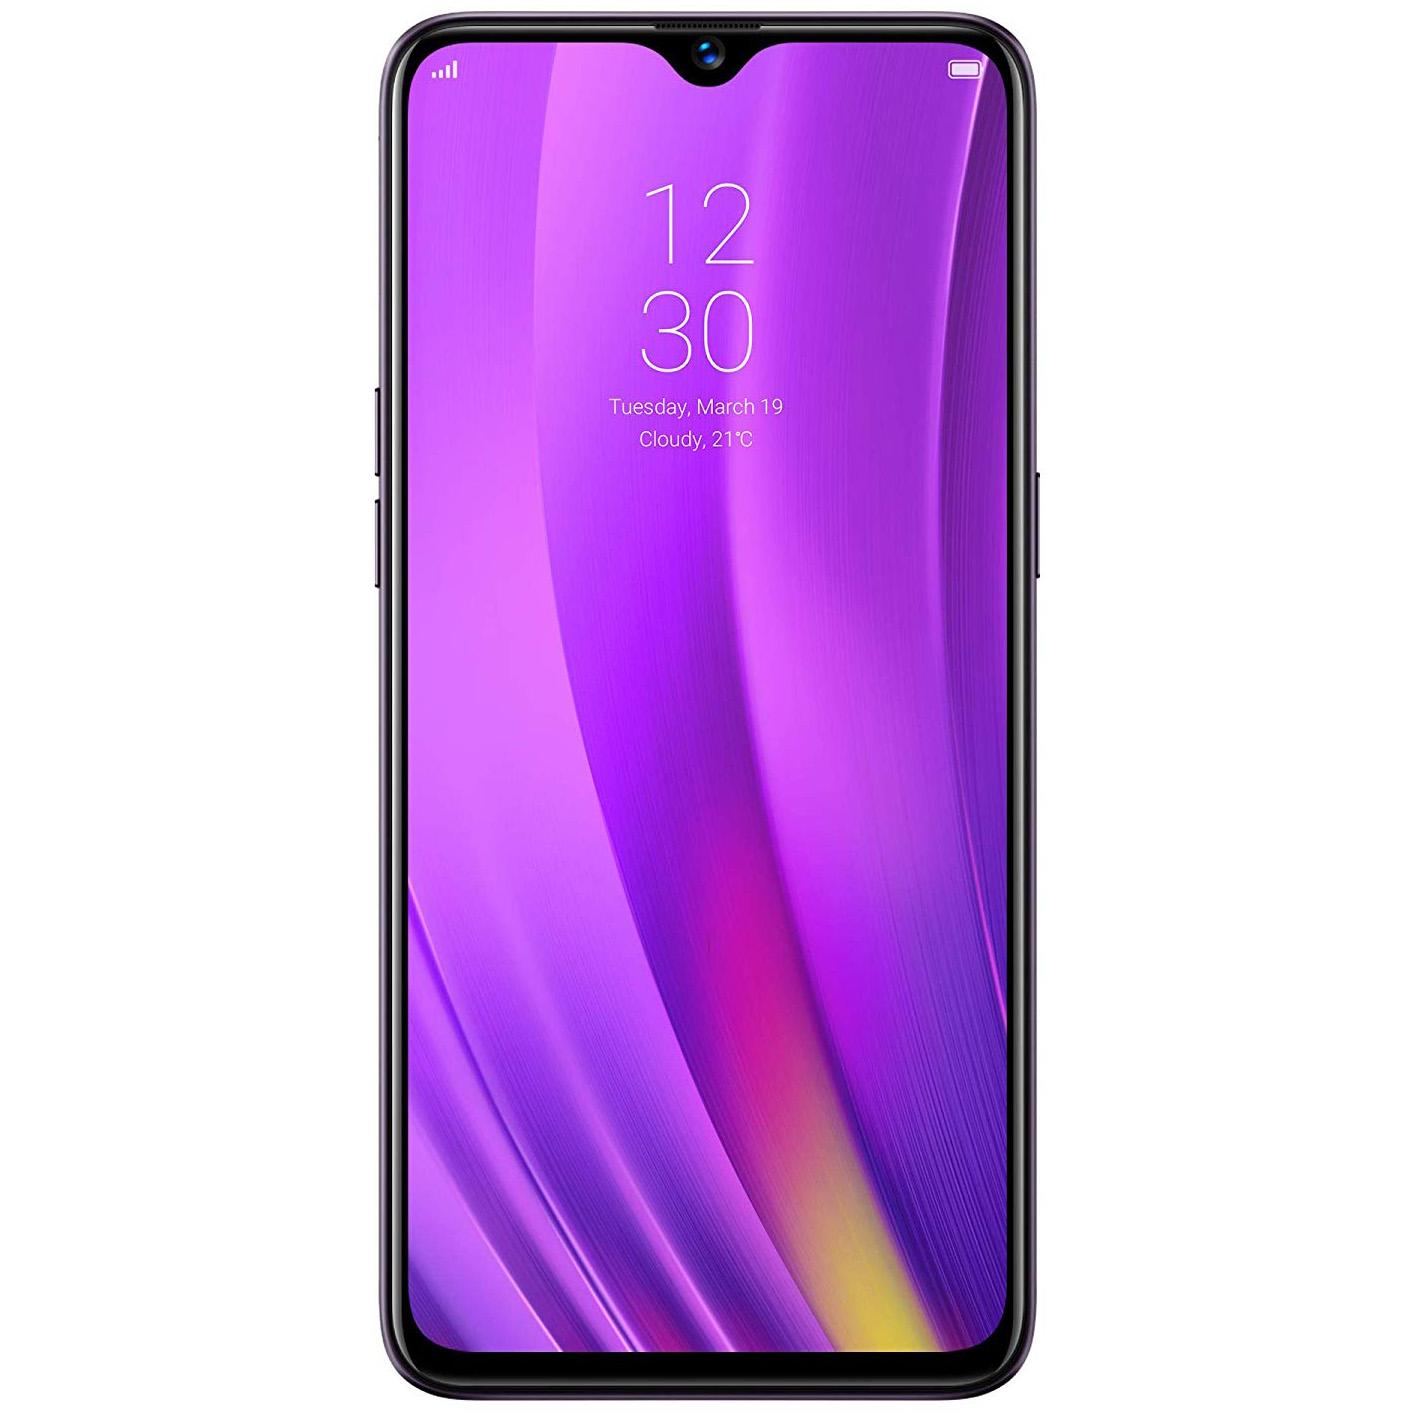 Telefon mobil Realme 3 Pro, Dual SIM, 128GB, 4GB RAM, 4G, Lightning Purple